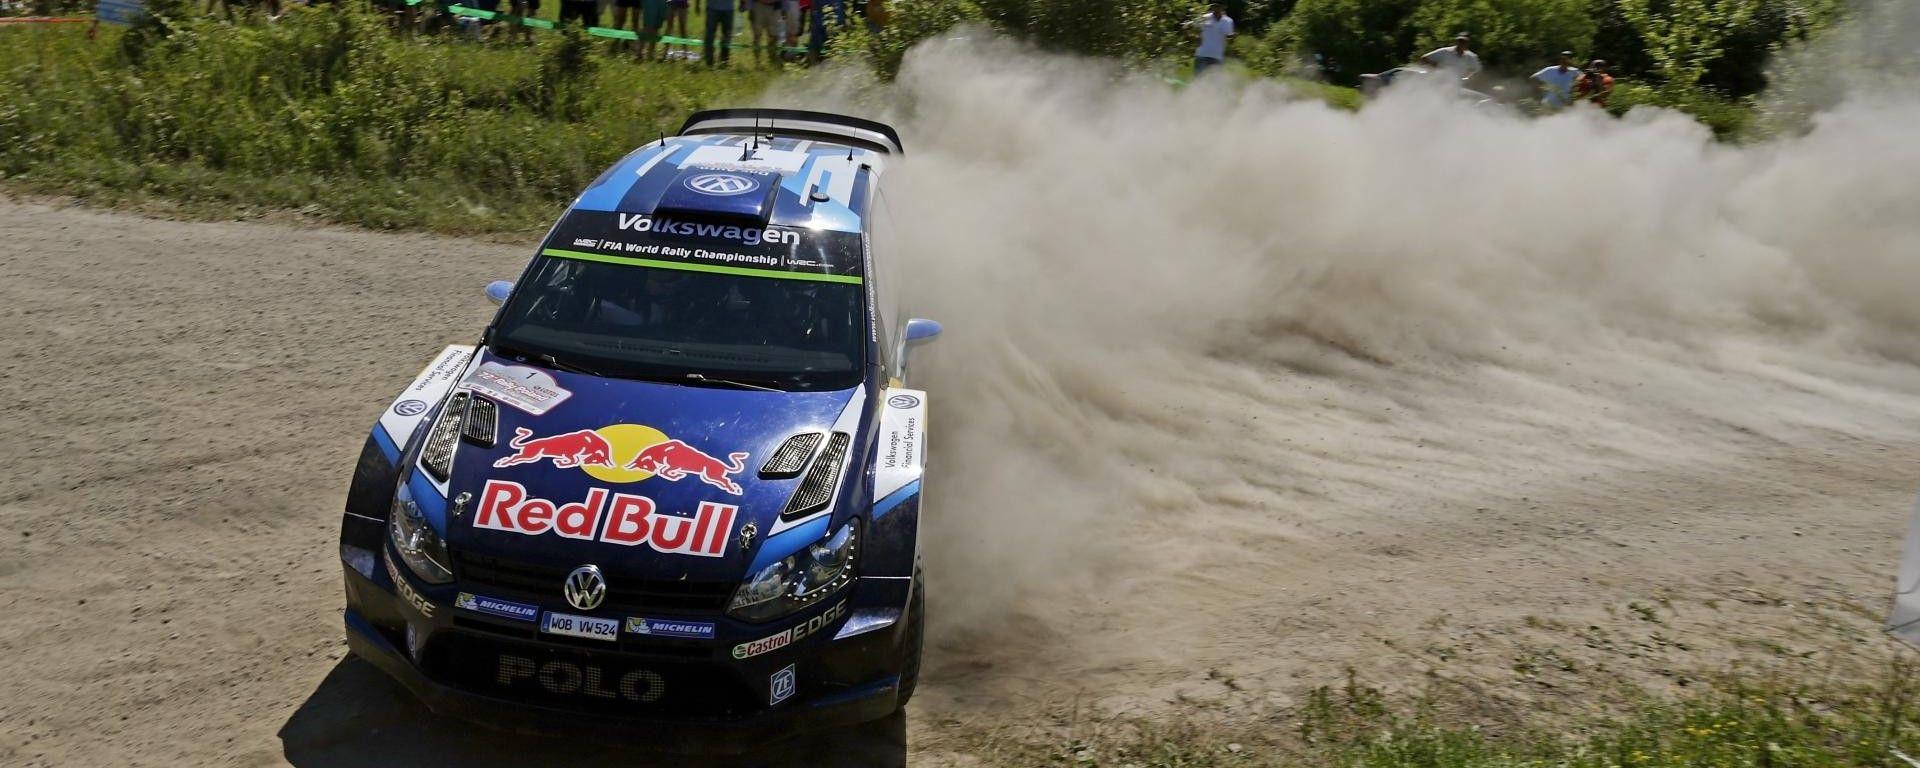 Polo R WRC - Rally Polonia 2016